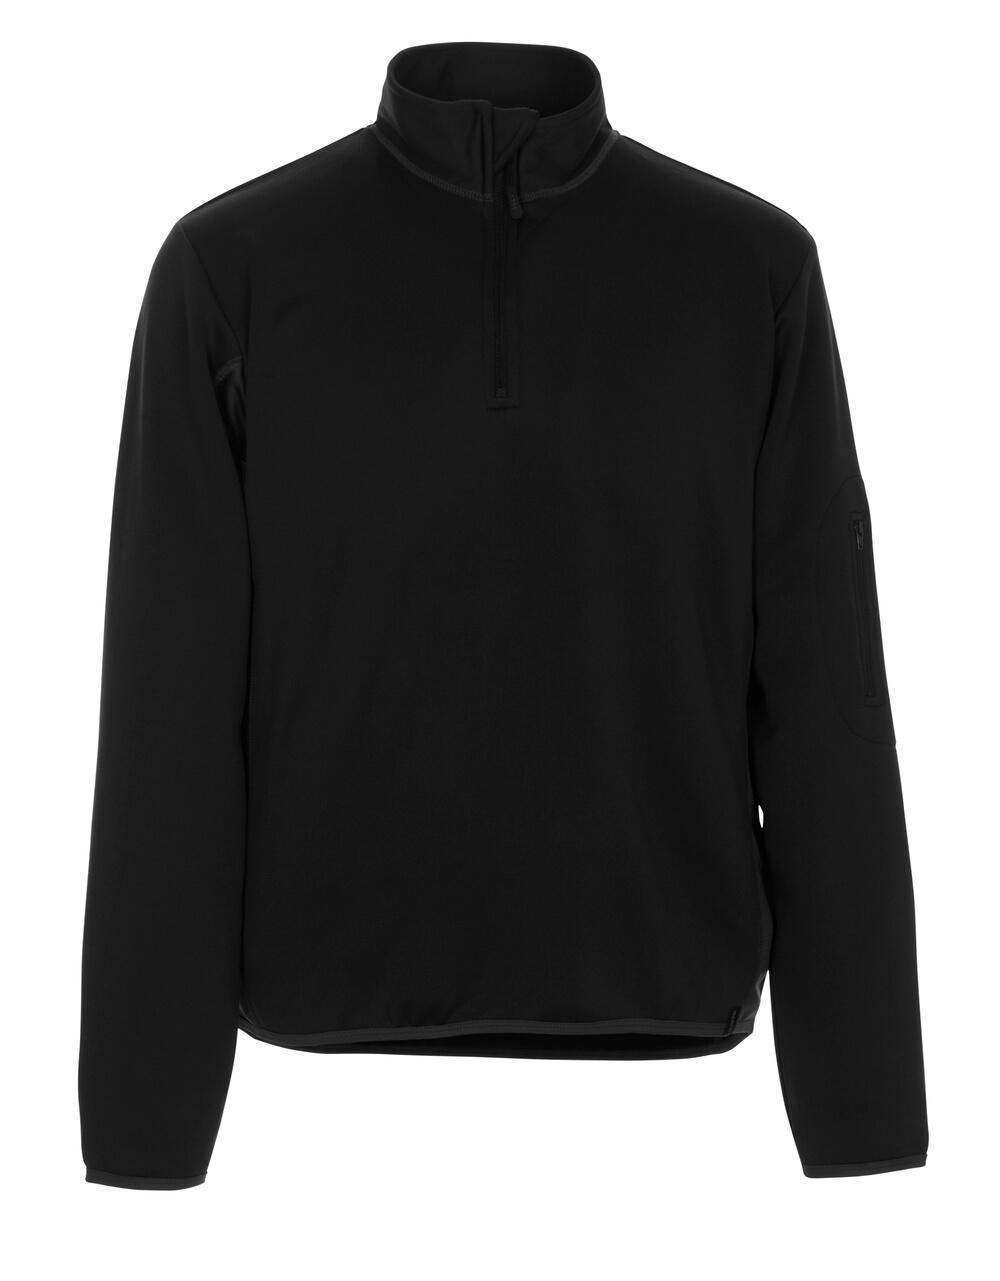 50068-828-0918 Polo Sweatshirt - black/dark anthracite